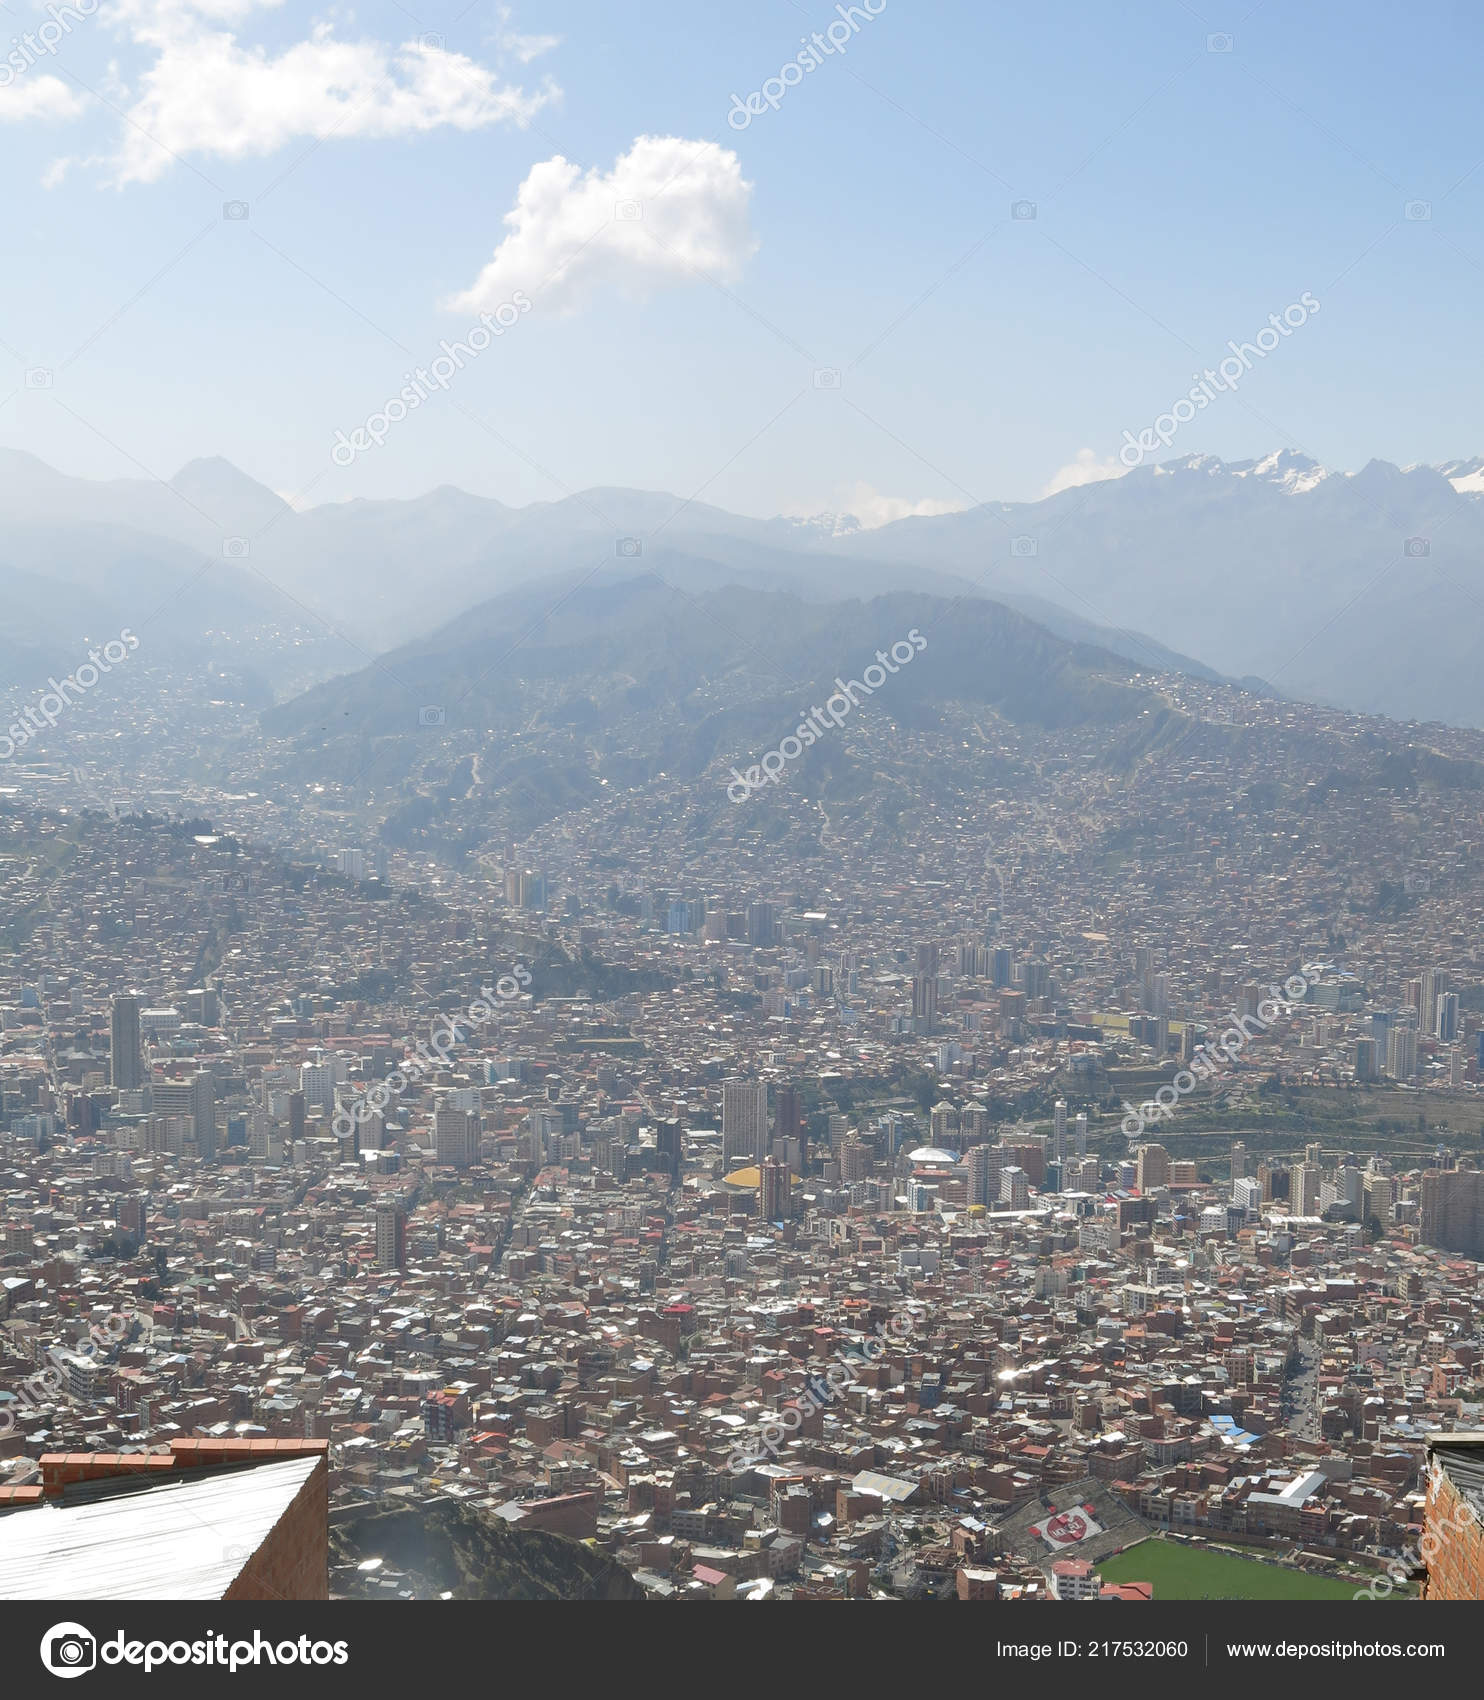 City Paz High Andes Mountains Bolivia Viewed Mirador Kilikili Background Stock Photo C Toniflap 217532060